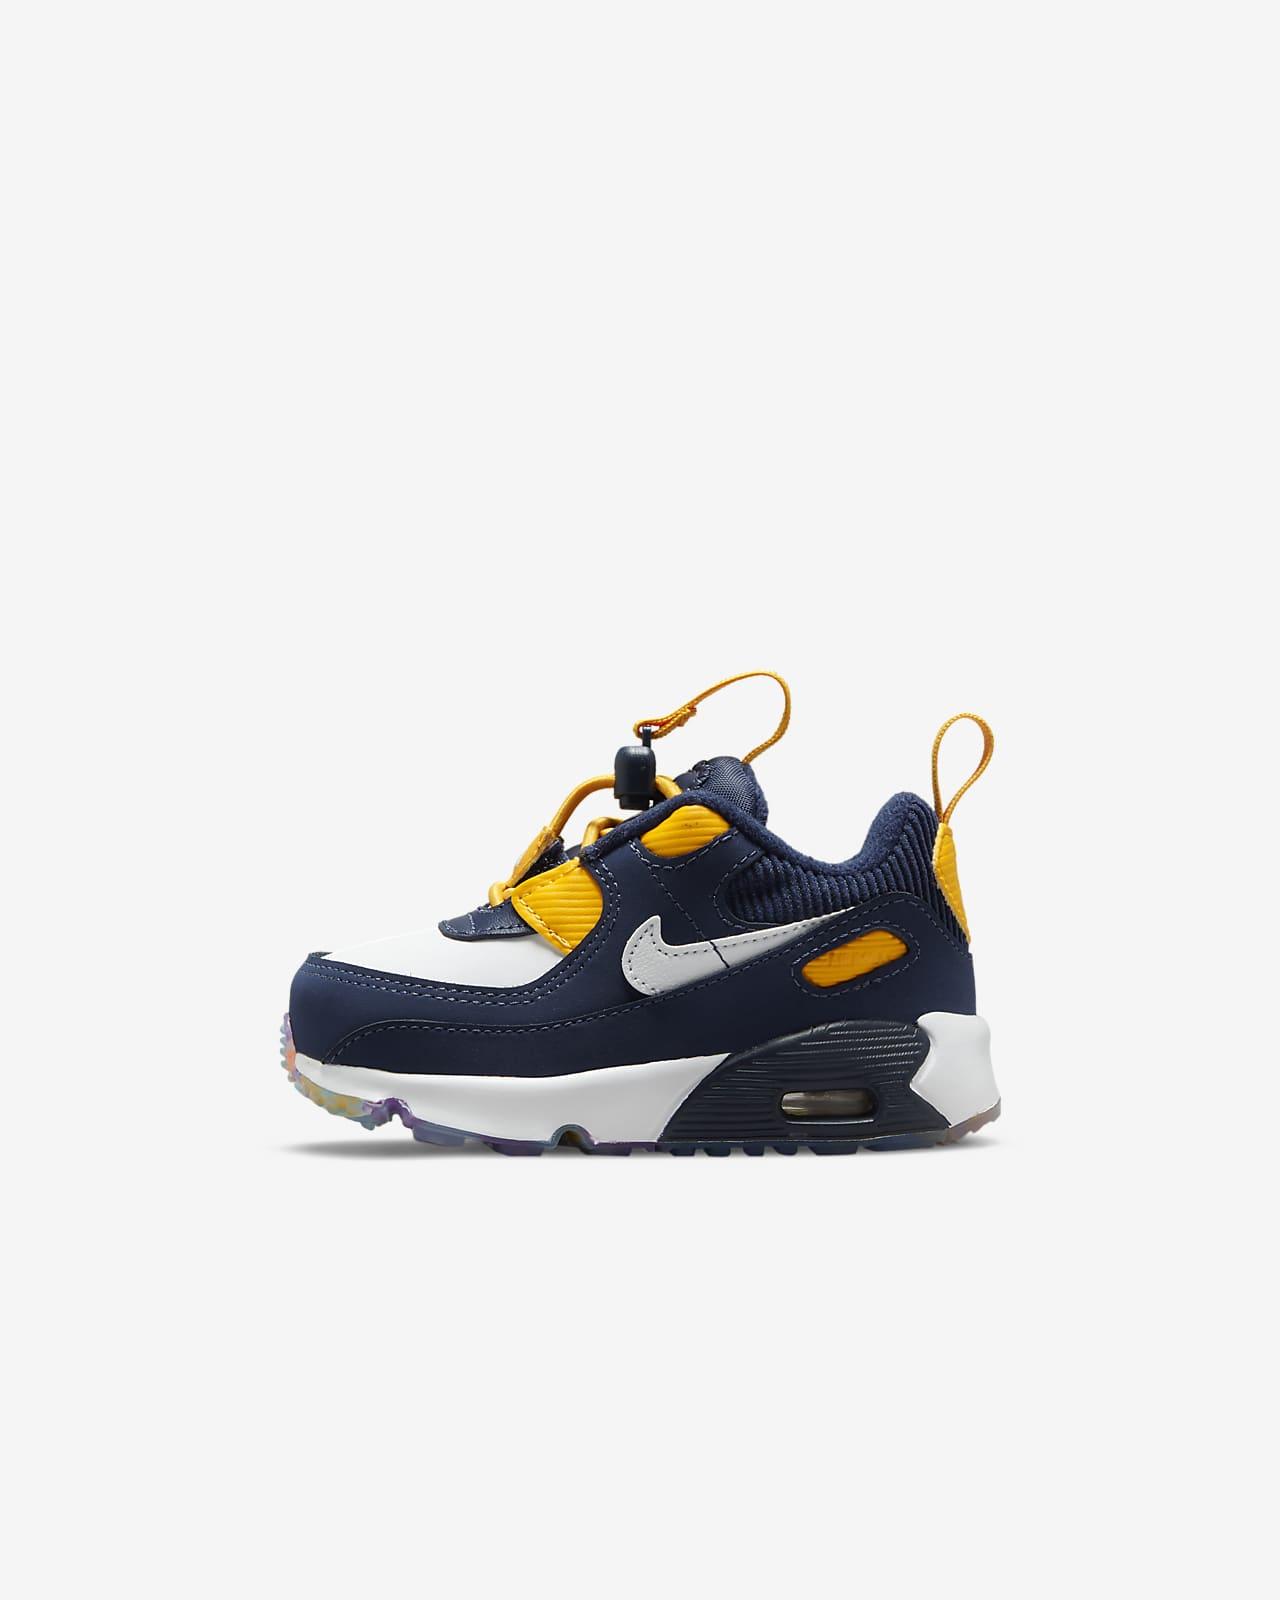 Nike Air Max 90 Toggle SE Baby/Toddler Shoes